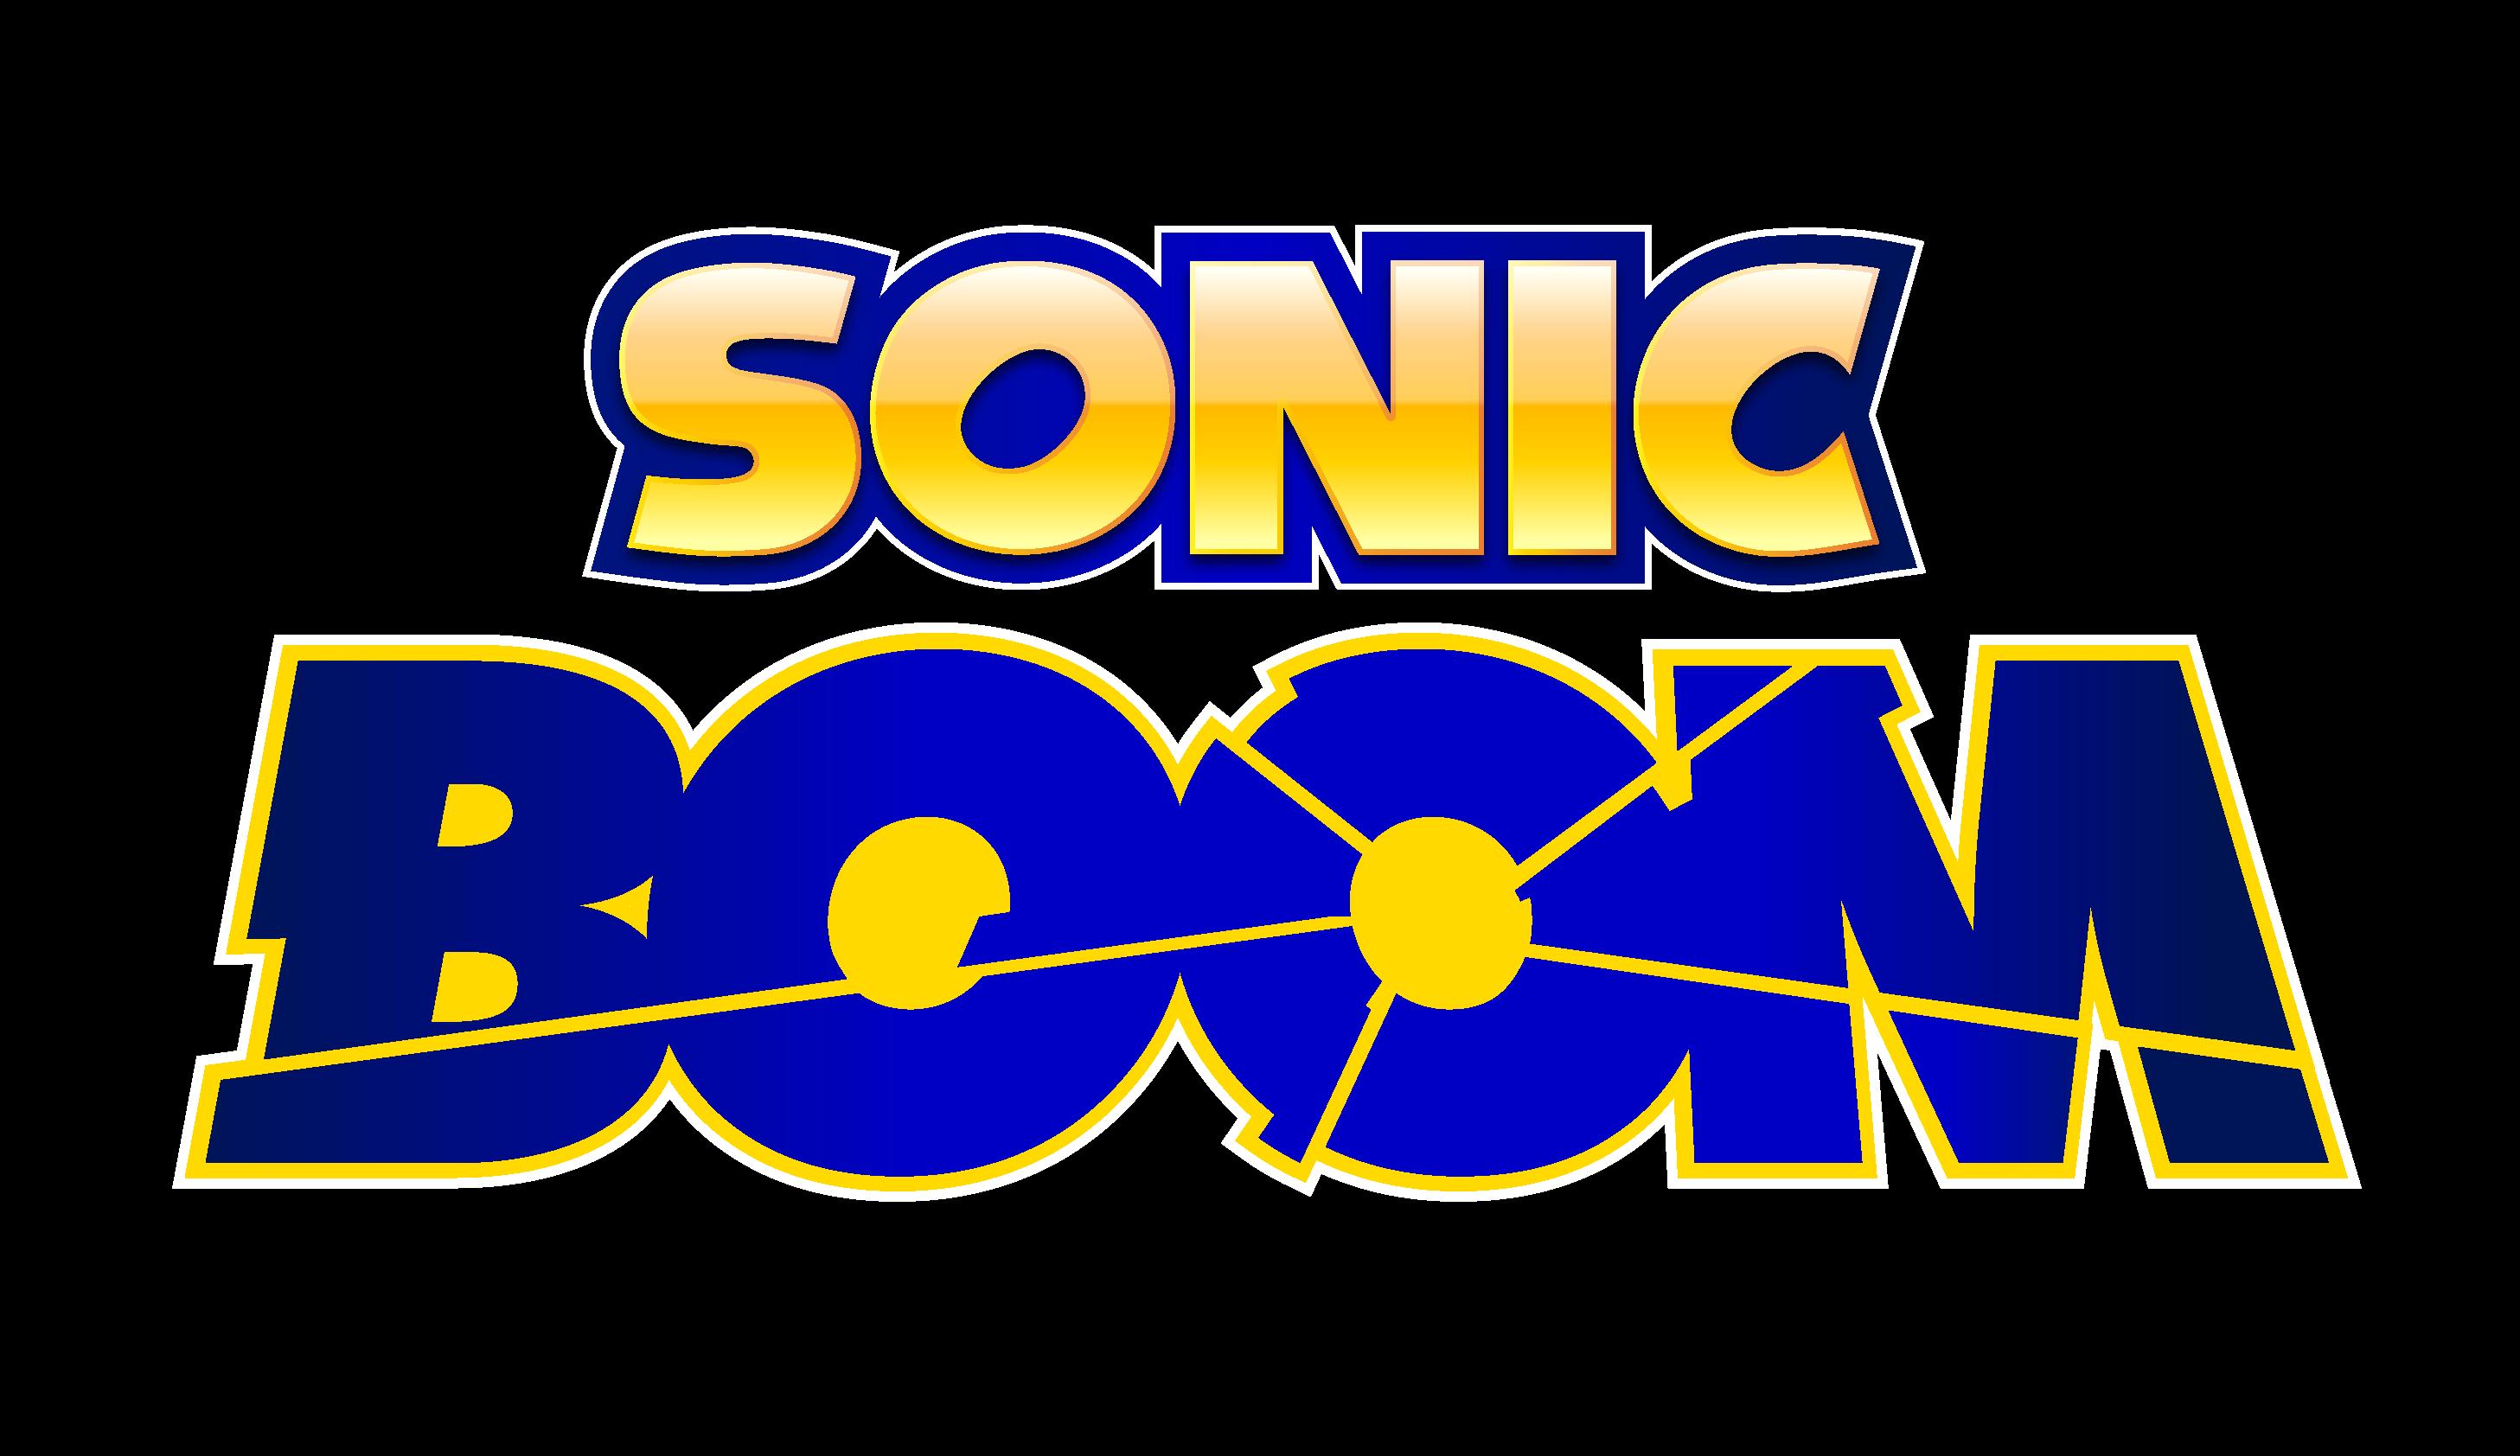 Sonic_Boom_Season_1_Logo_Blue_Boom_Yellow_Outline_with_White-prsrm.png